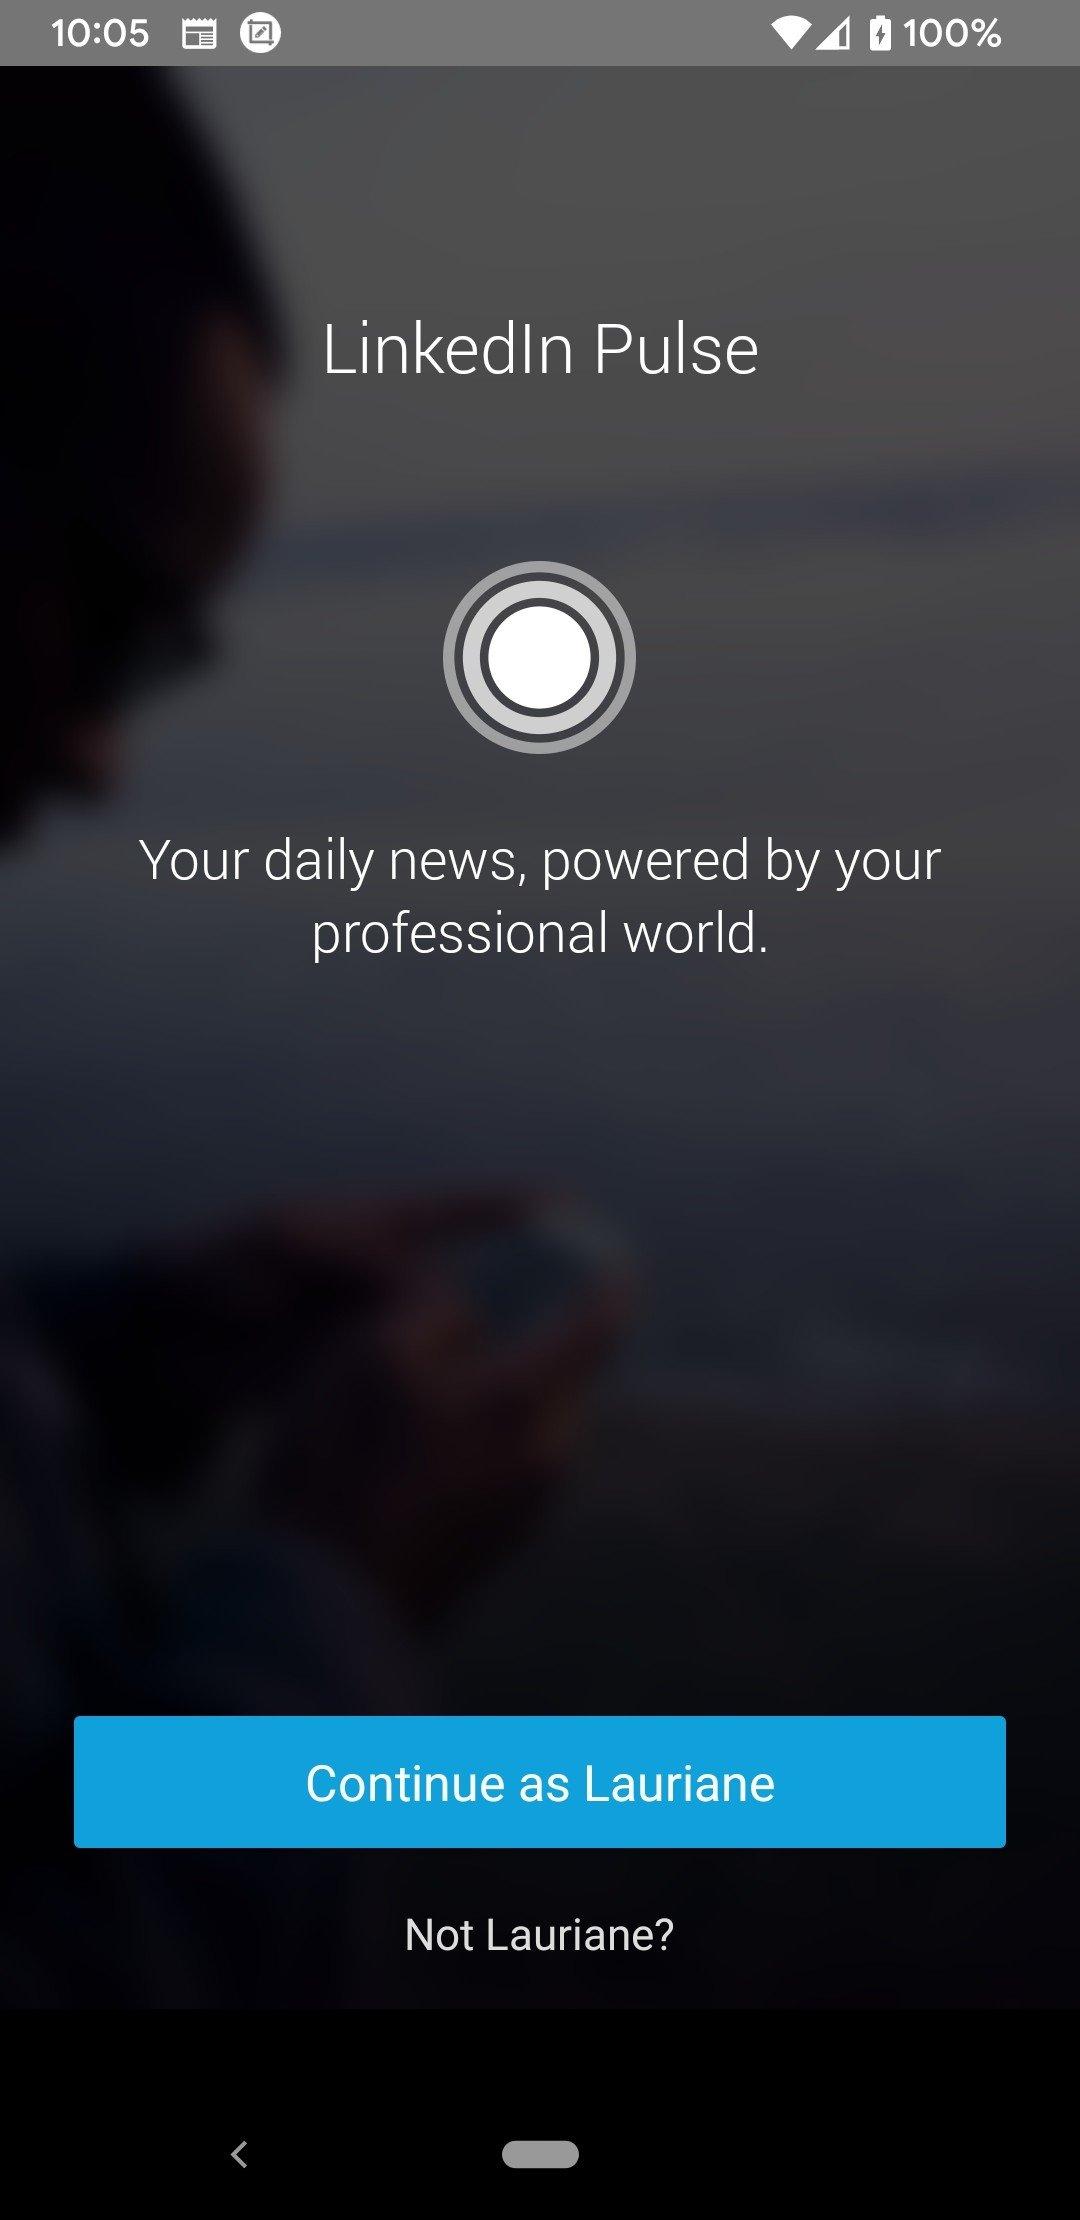 скачать программа для андроид для чтения Word - фото 5